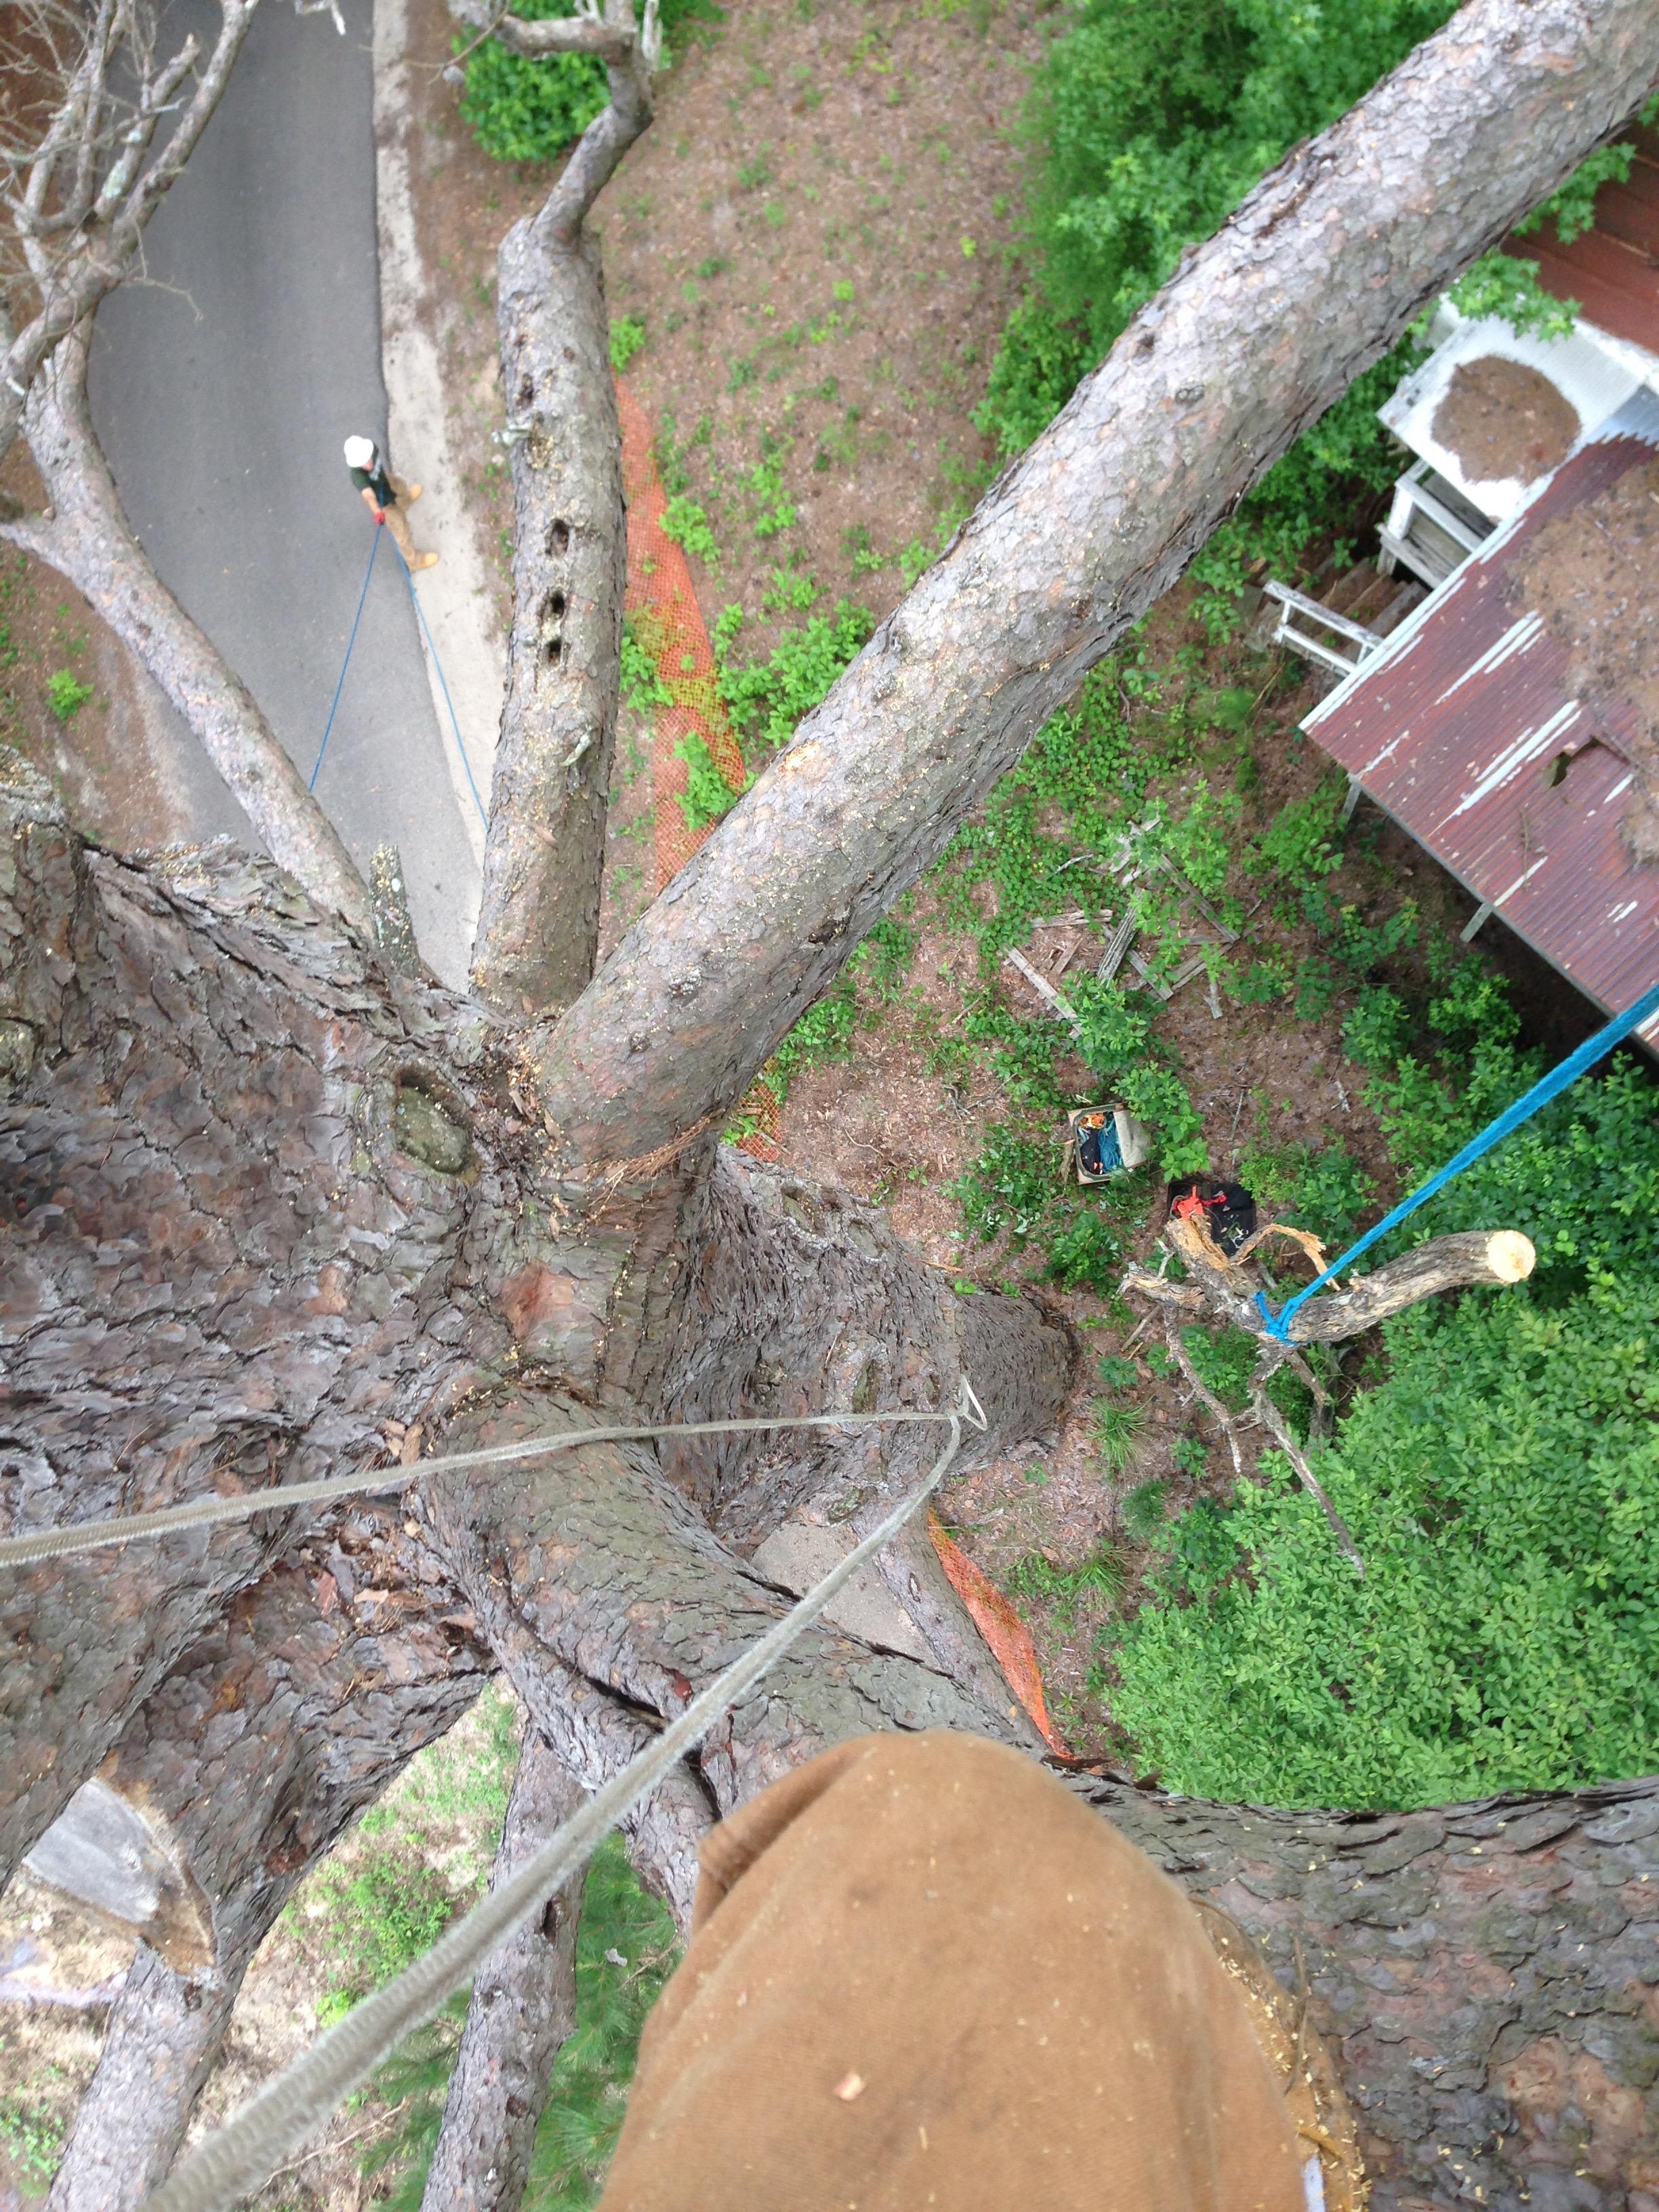 Hazard Pruning